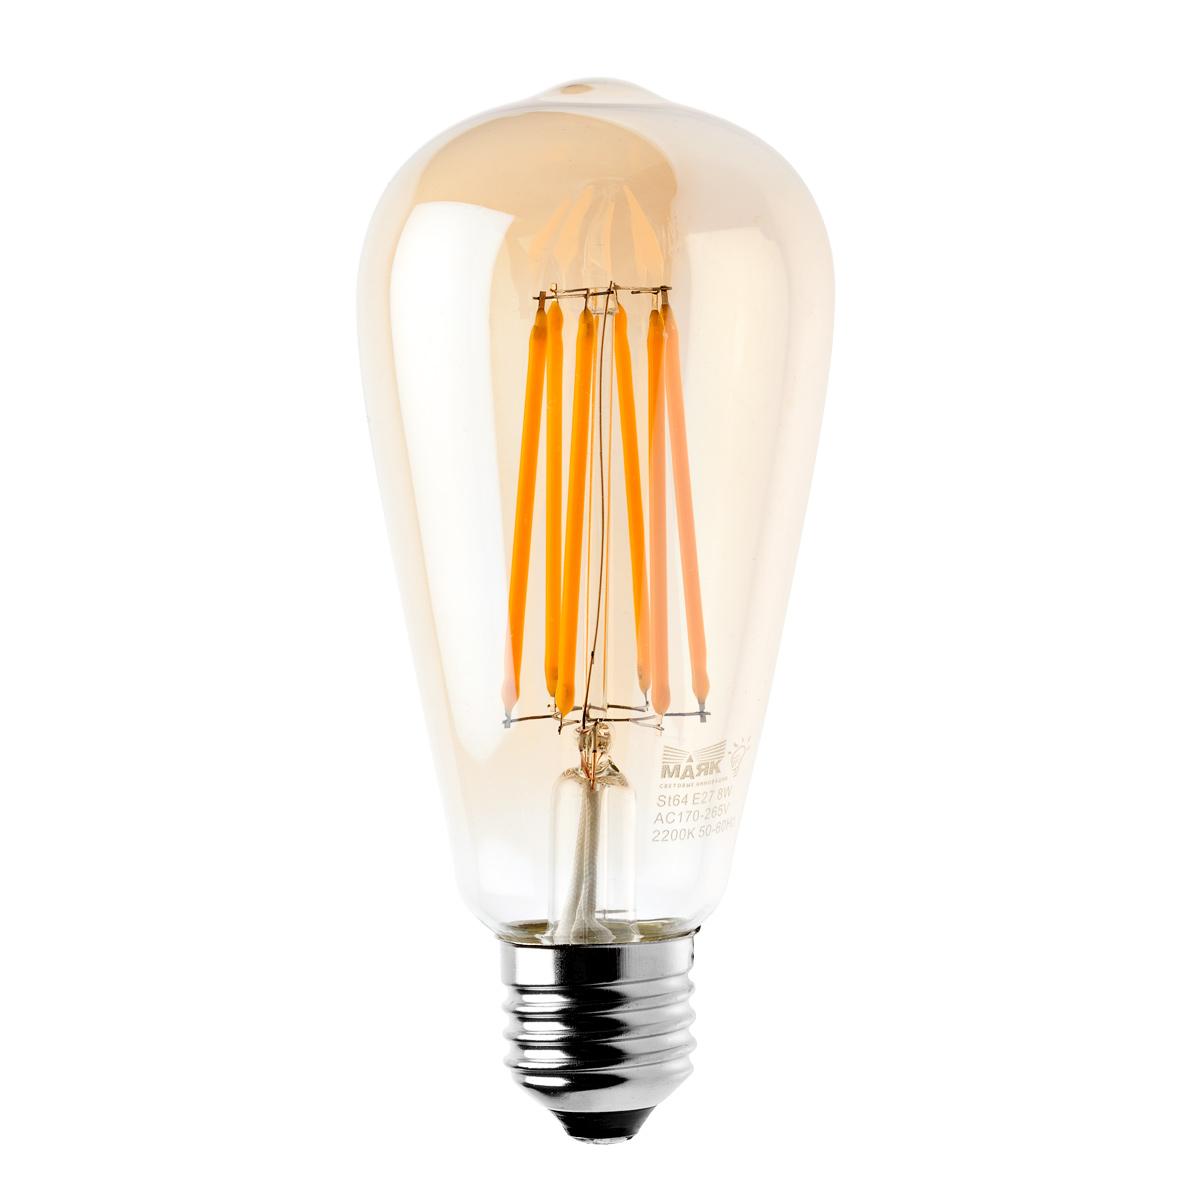 Лампа светодиодная МАЯК Led-st64df/8w/2200